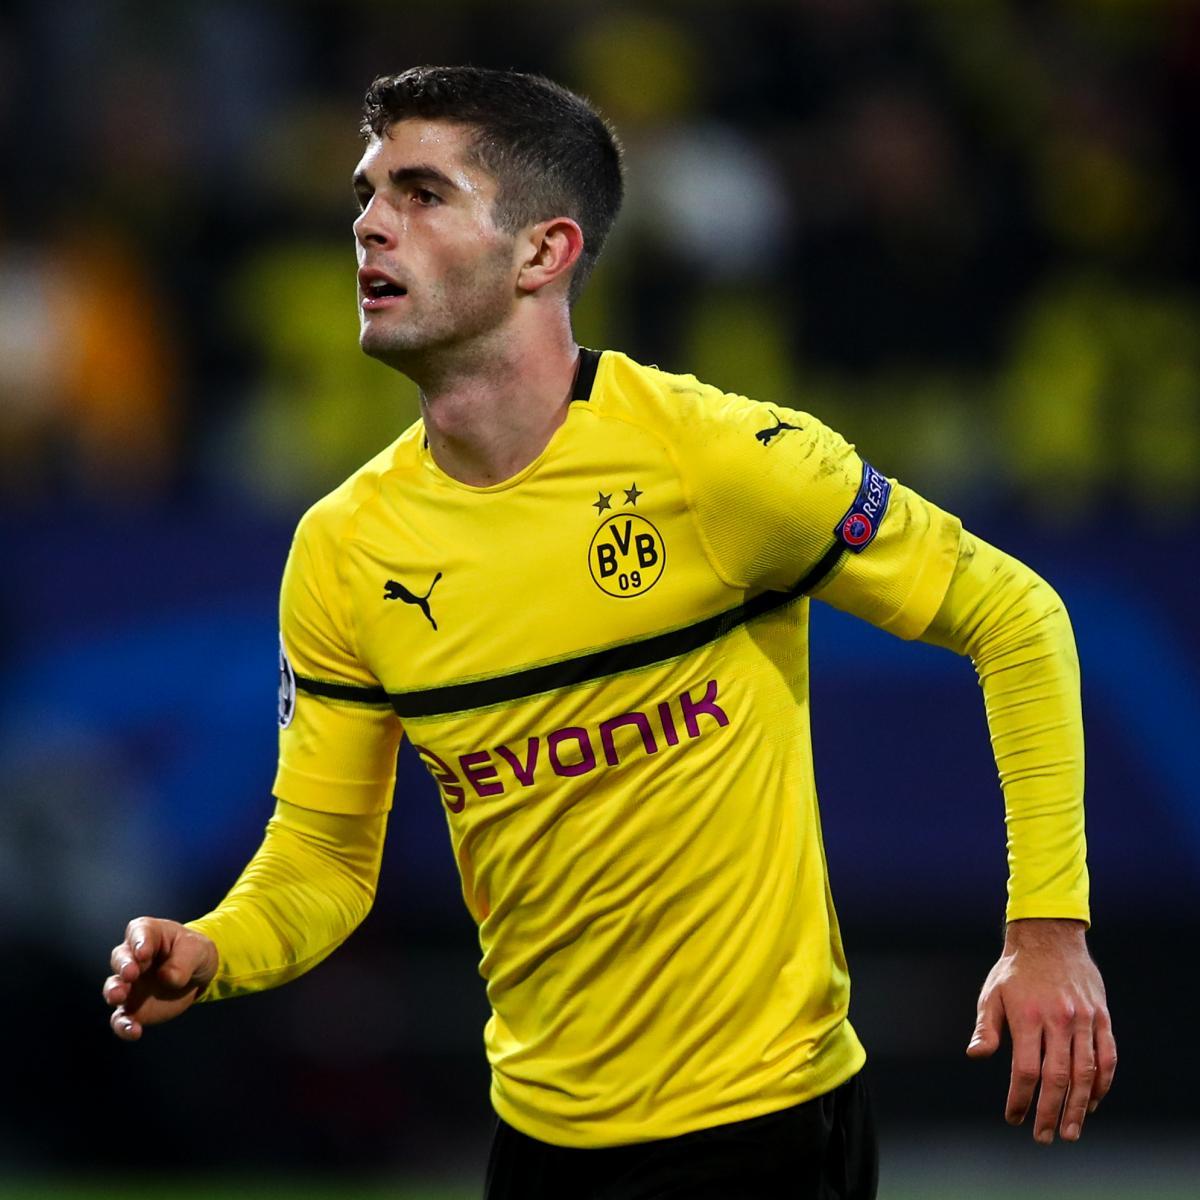 Tottenham Vs. Borussia Dortmund: How To Watch, Live Stream